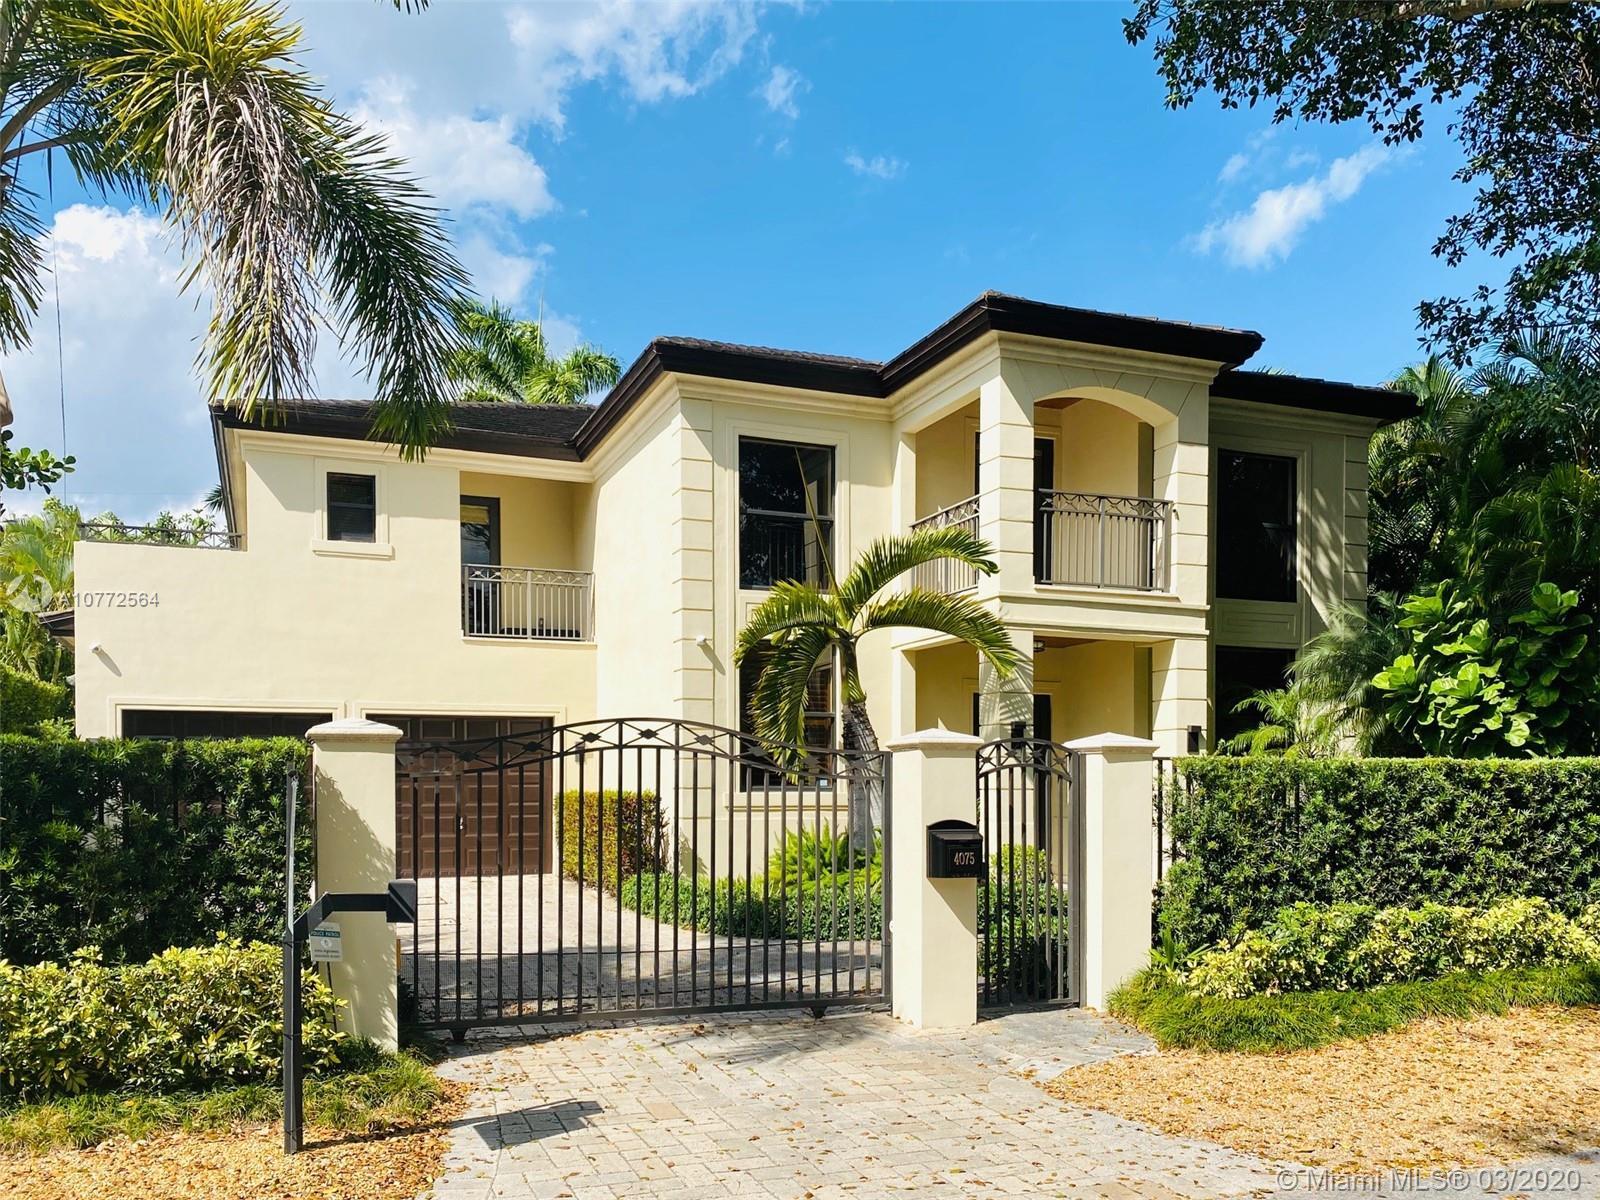 4075  Bonita Ave  For Sale A10772564, FL